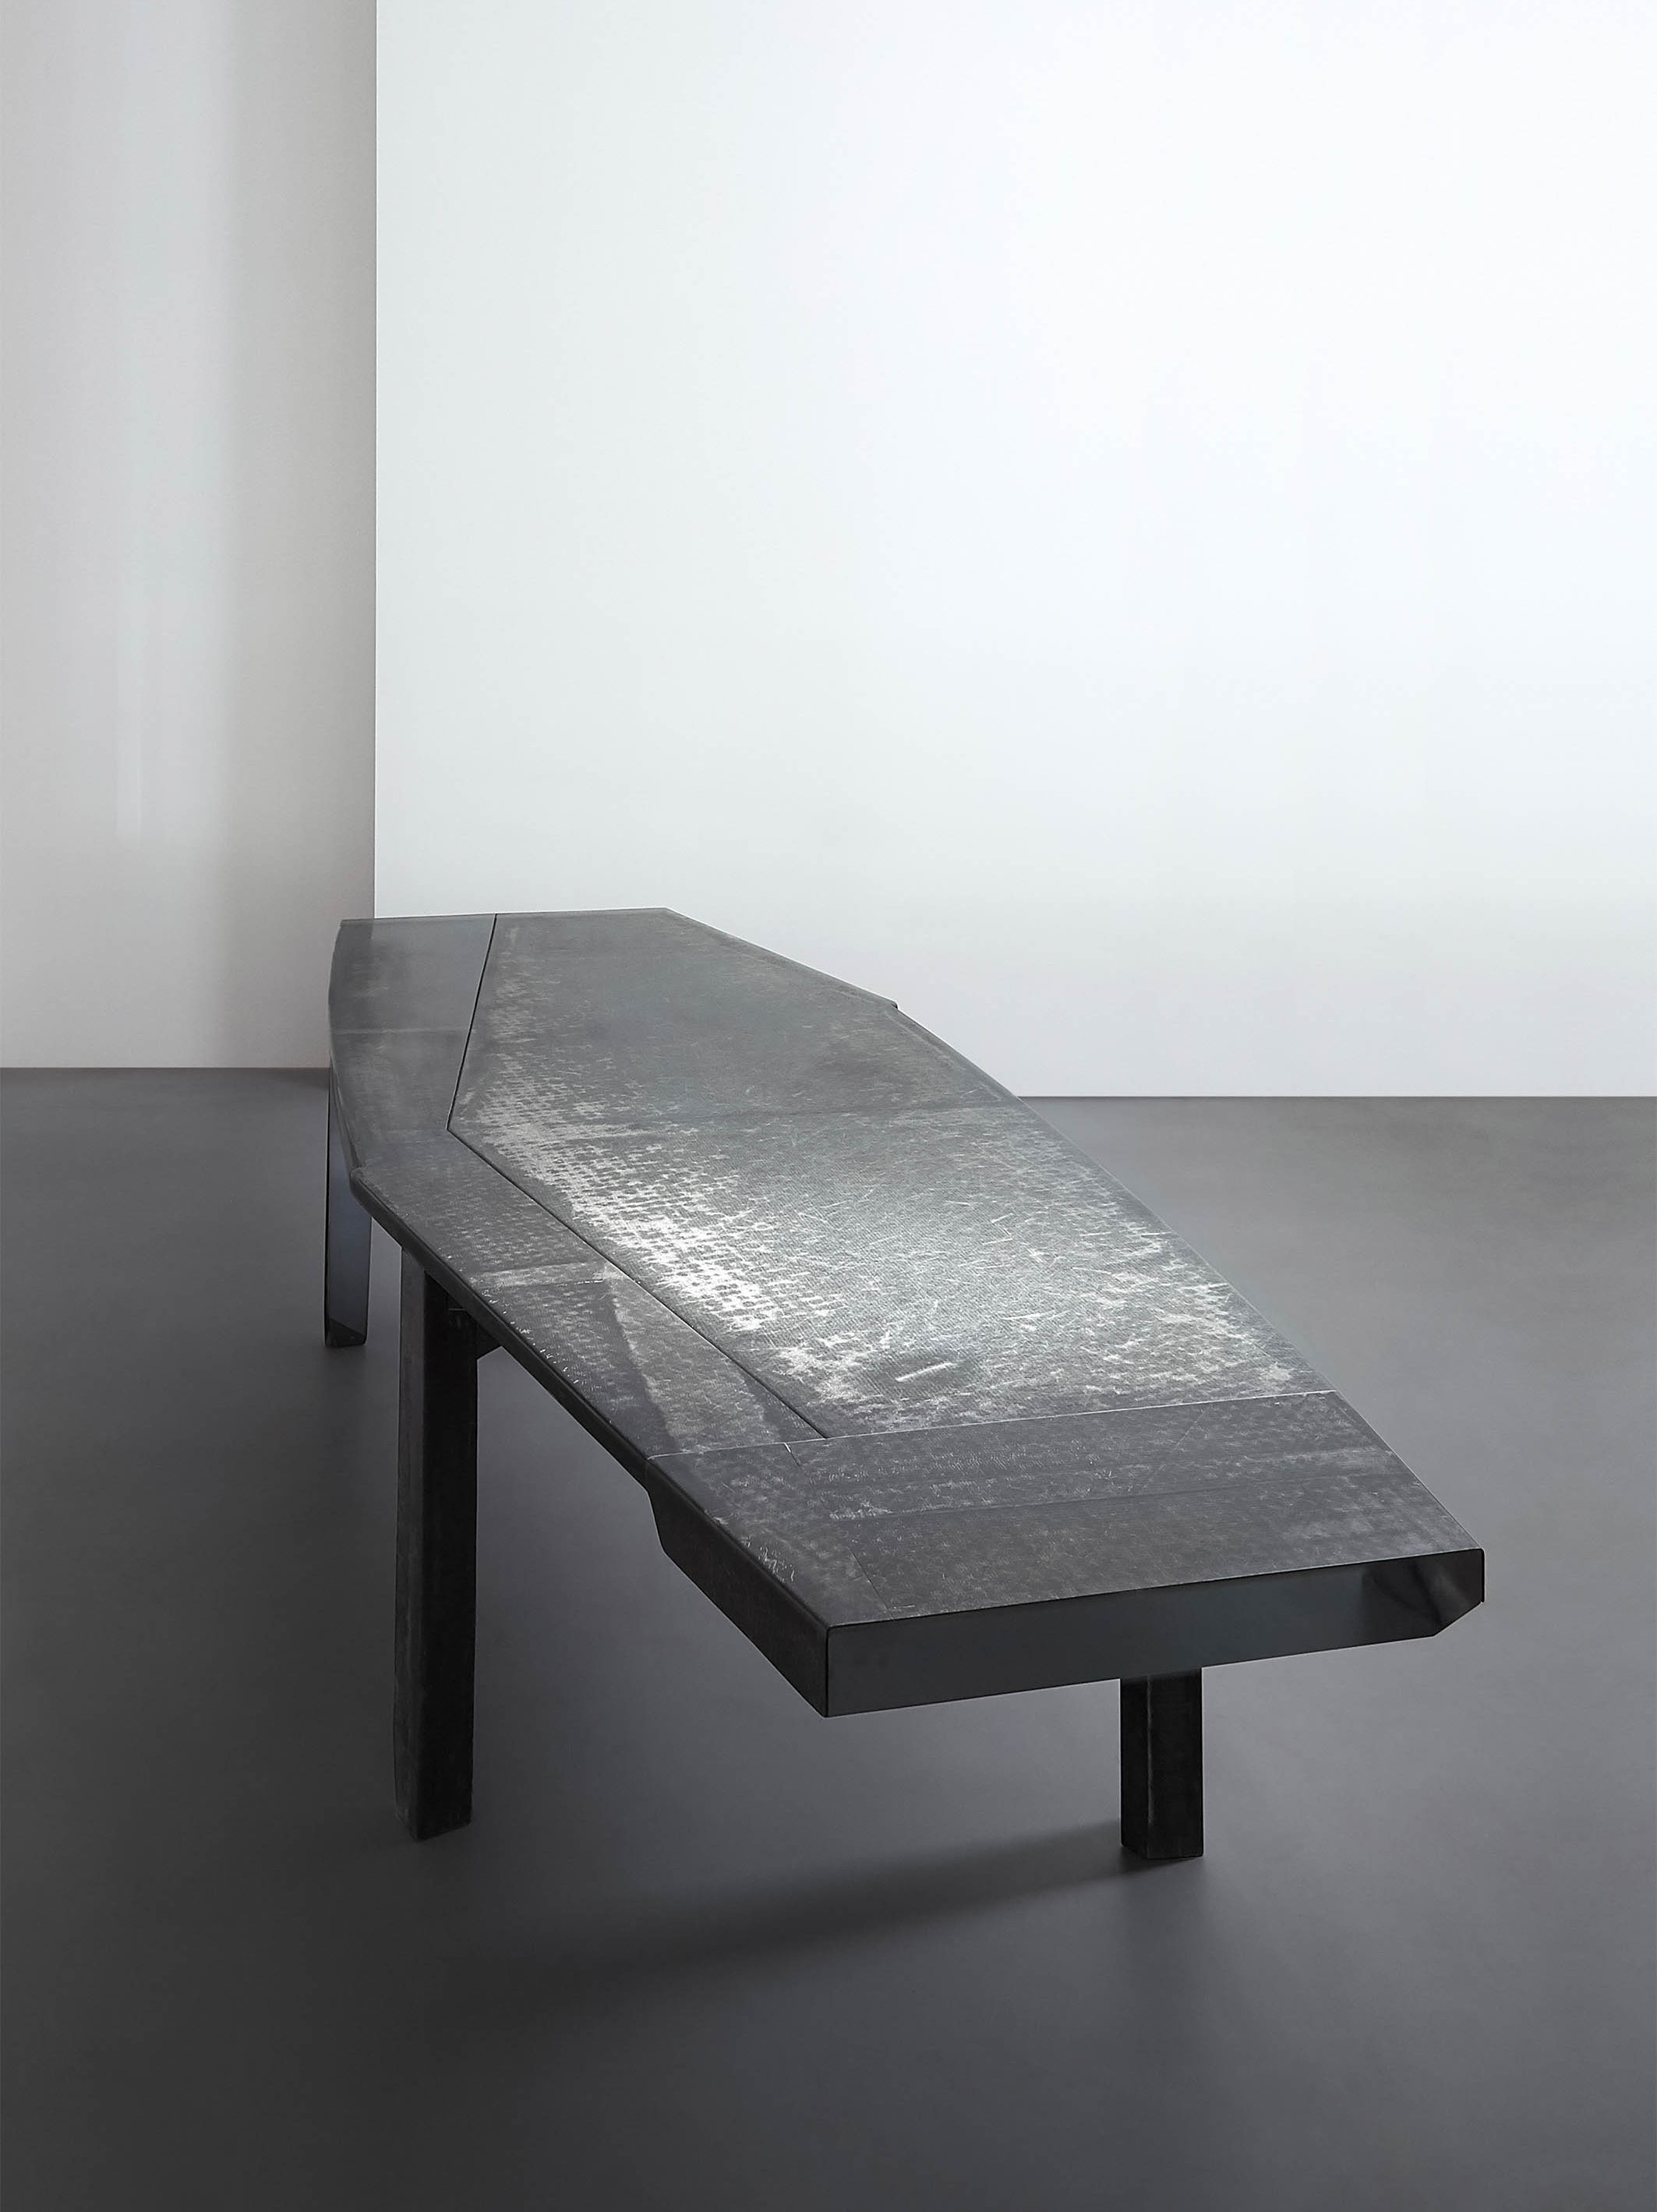 Vincenzo De Cotiis - features-oped, design - Vincenzo De Cotiis, StyleZeitgeist, Interior Design, Furniture, Eugene Rabkin, Art, 2017